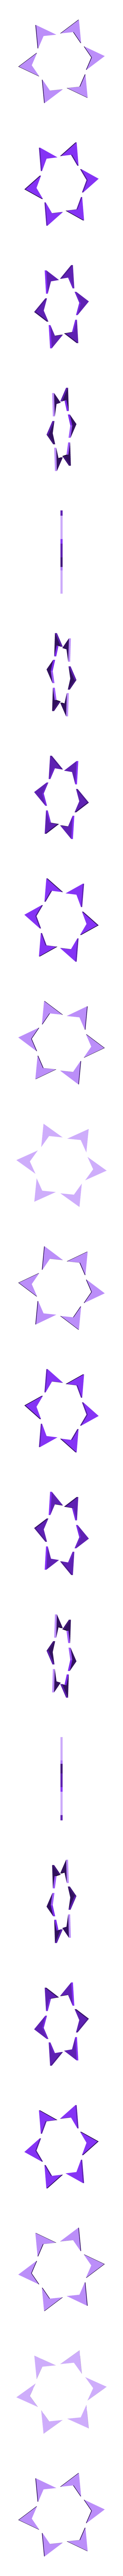 HexaStarOuter.stl Download free STL file Hexagram, Hexagonal Star, Hexagon Puzzle • 3D printing model, LGBU